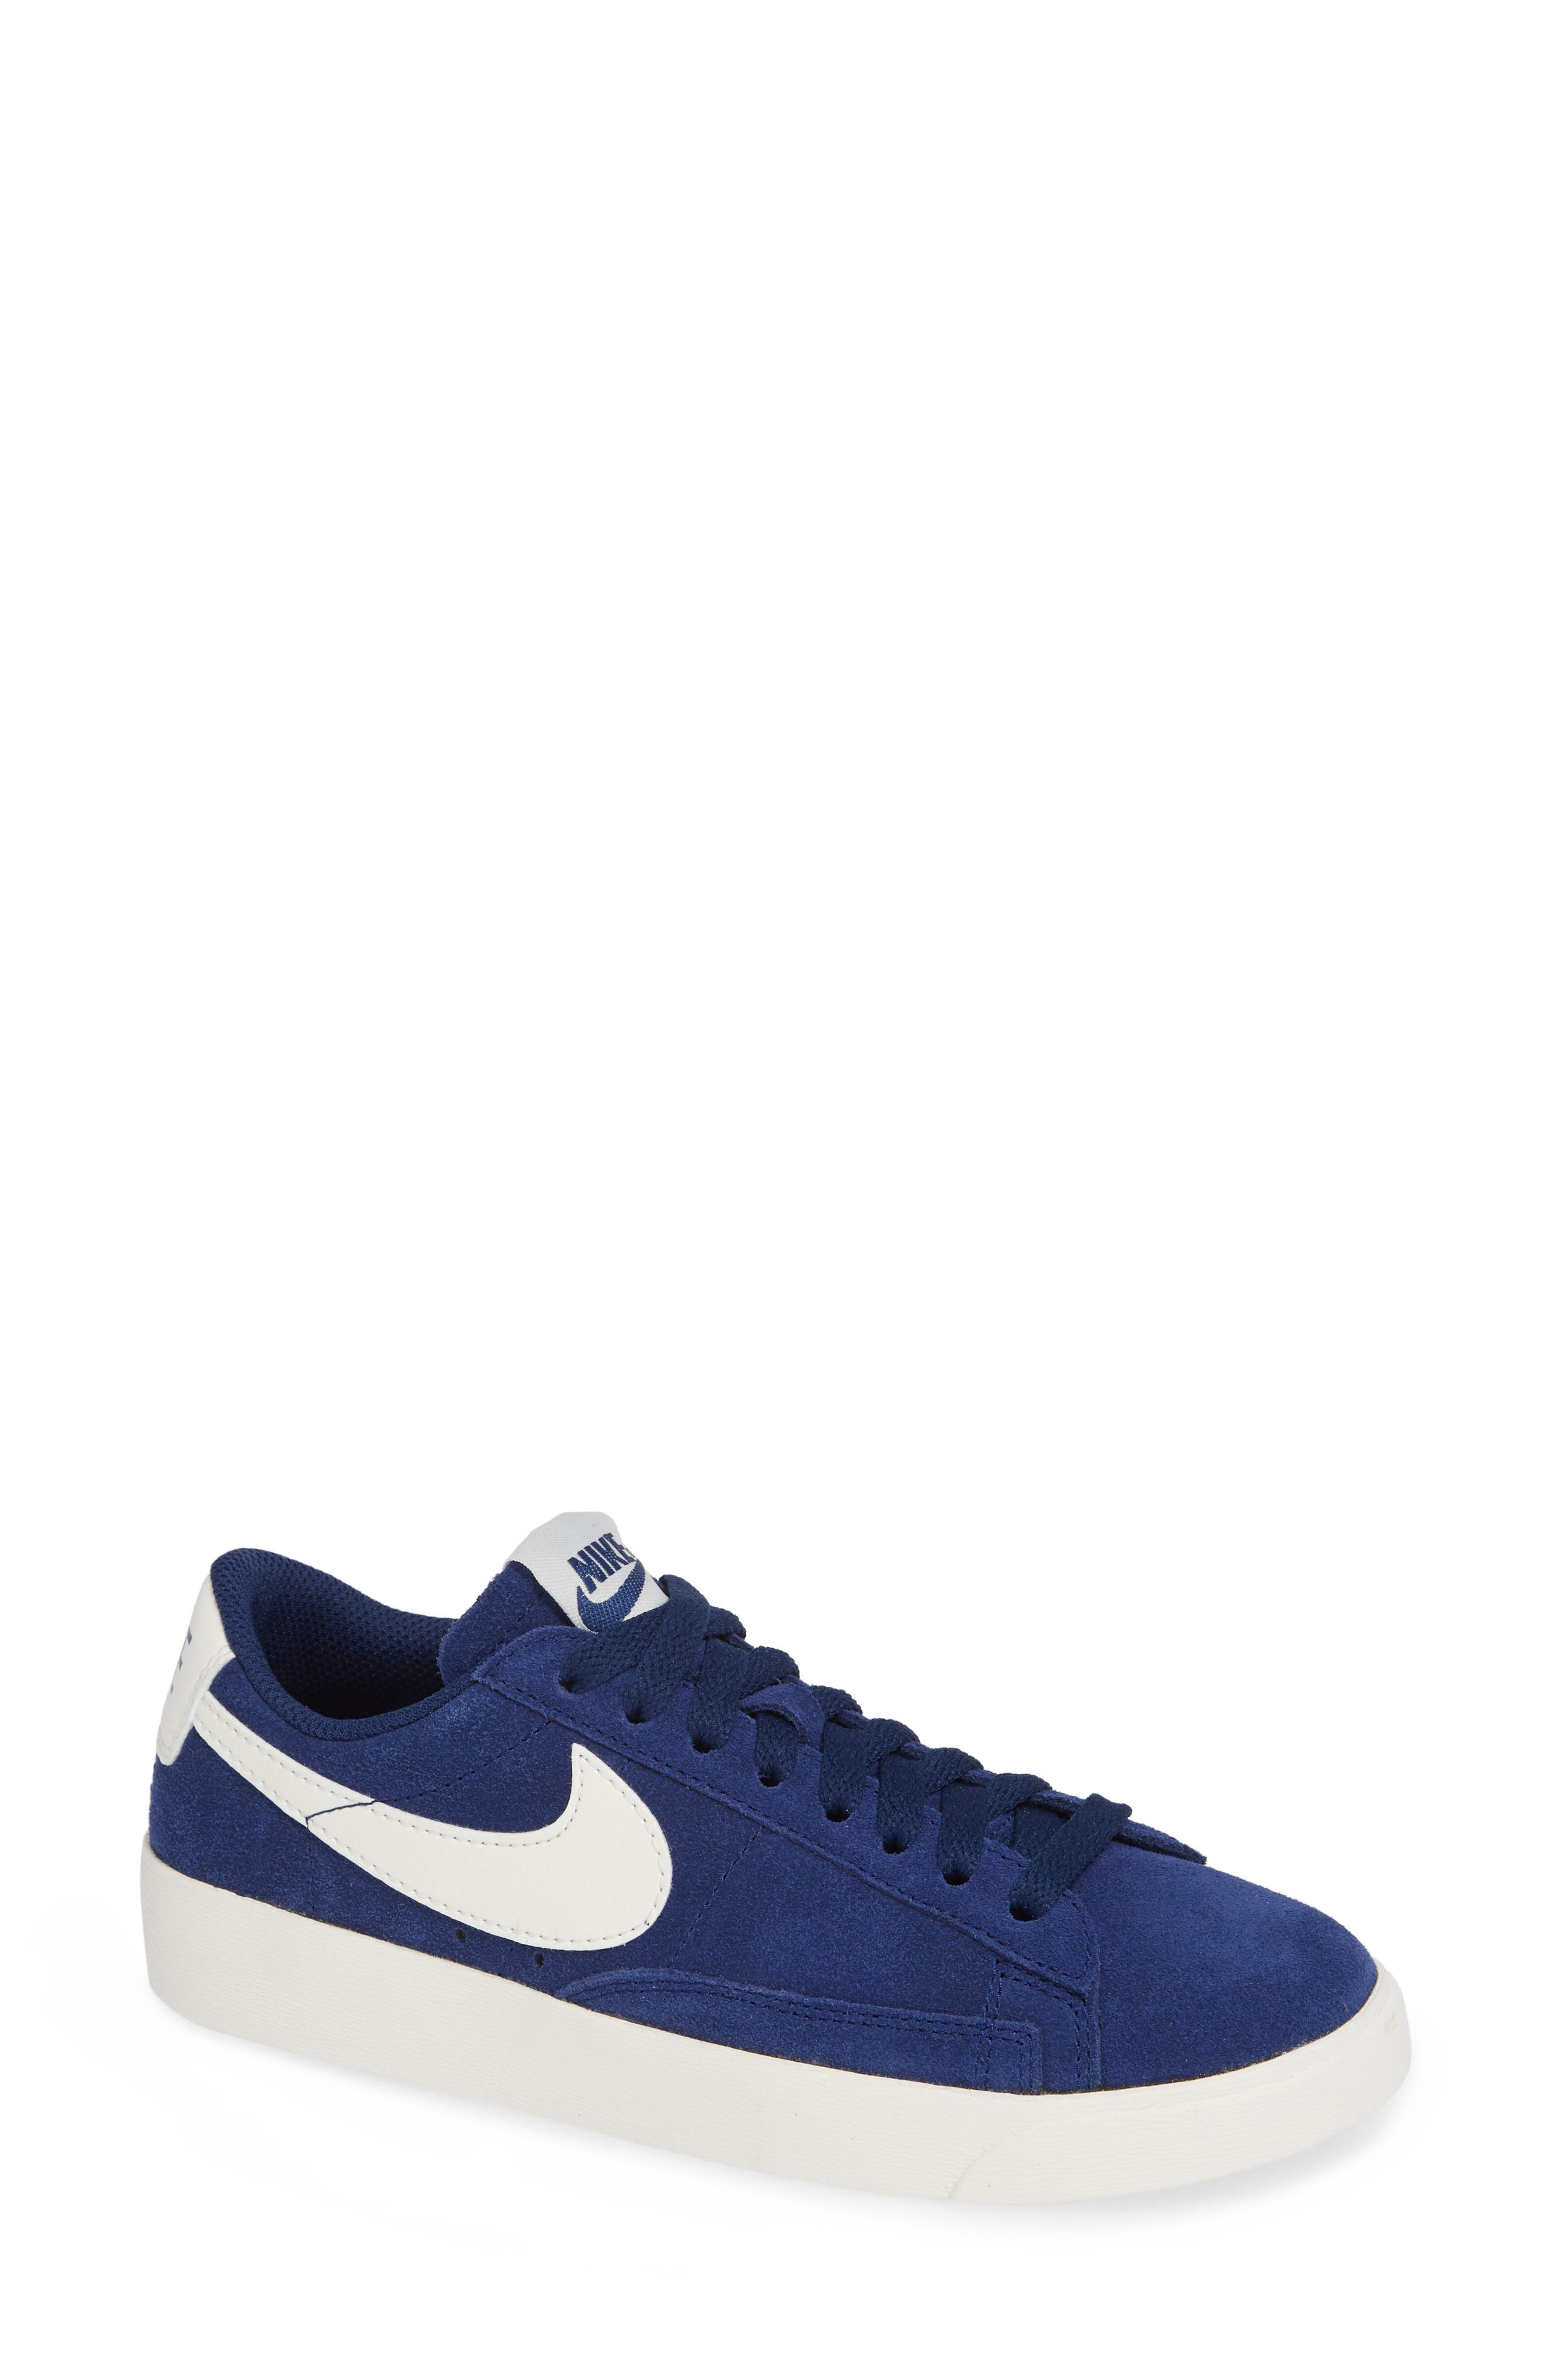 Blazer Low Sneaker,                         Main,                         color, 402